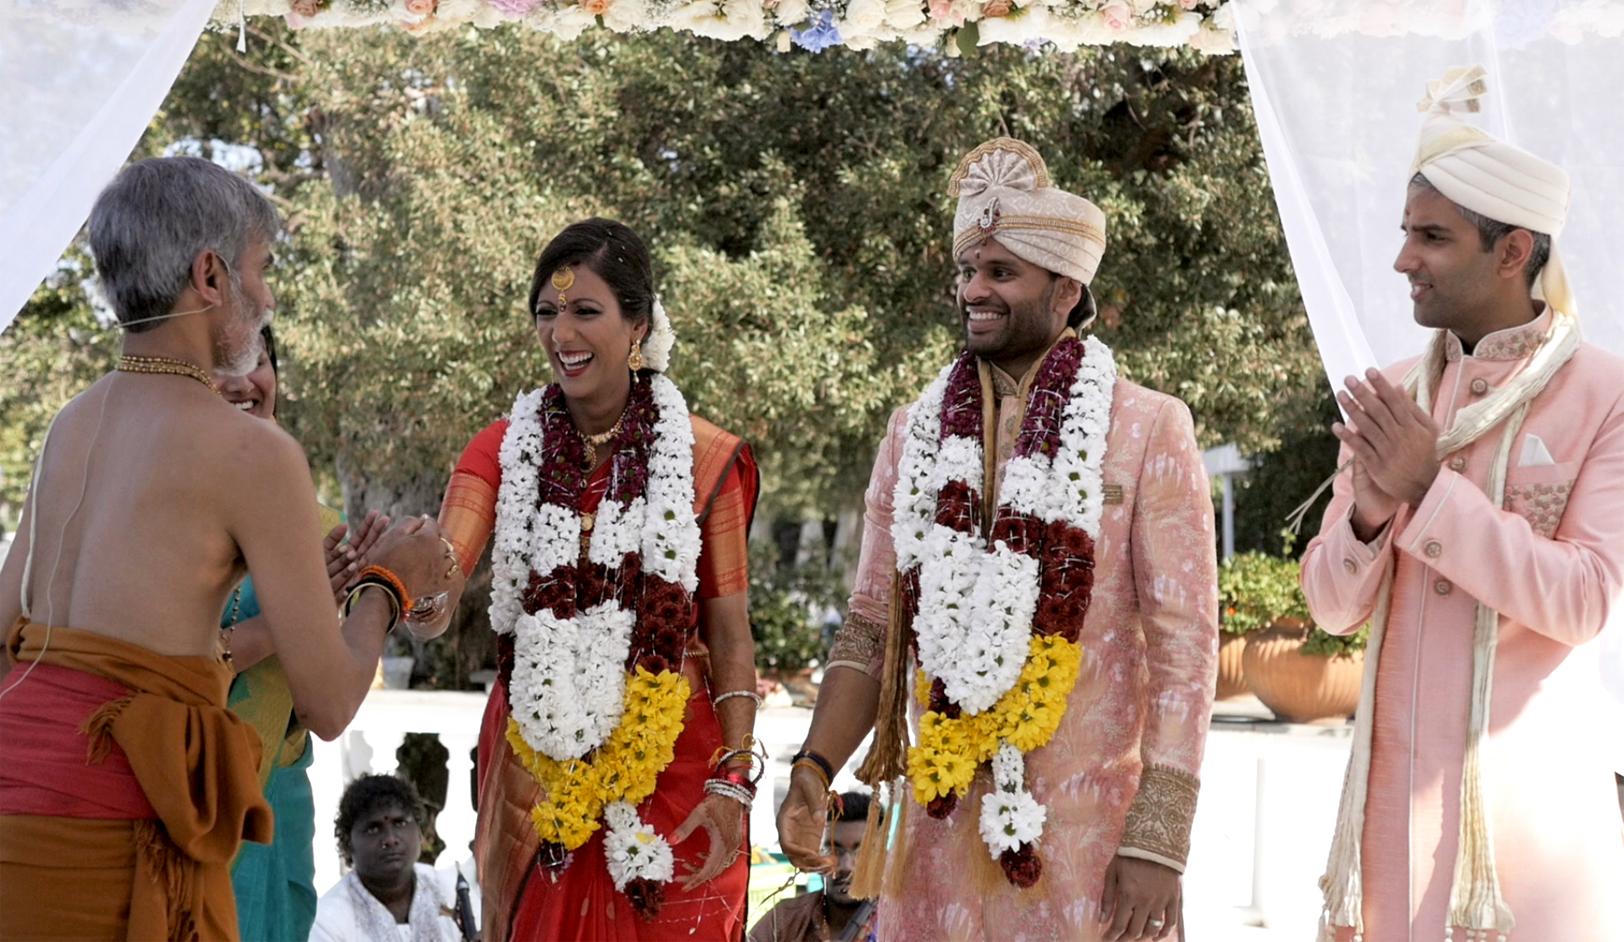 matrimonio-indiano-sposa-sposo-hotel-cocumella-sorrento-amalfi-italia.jpg